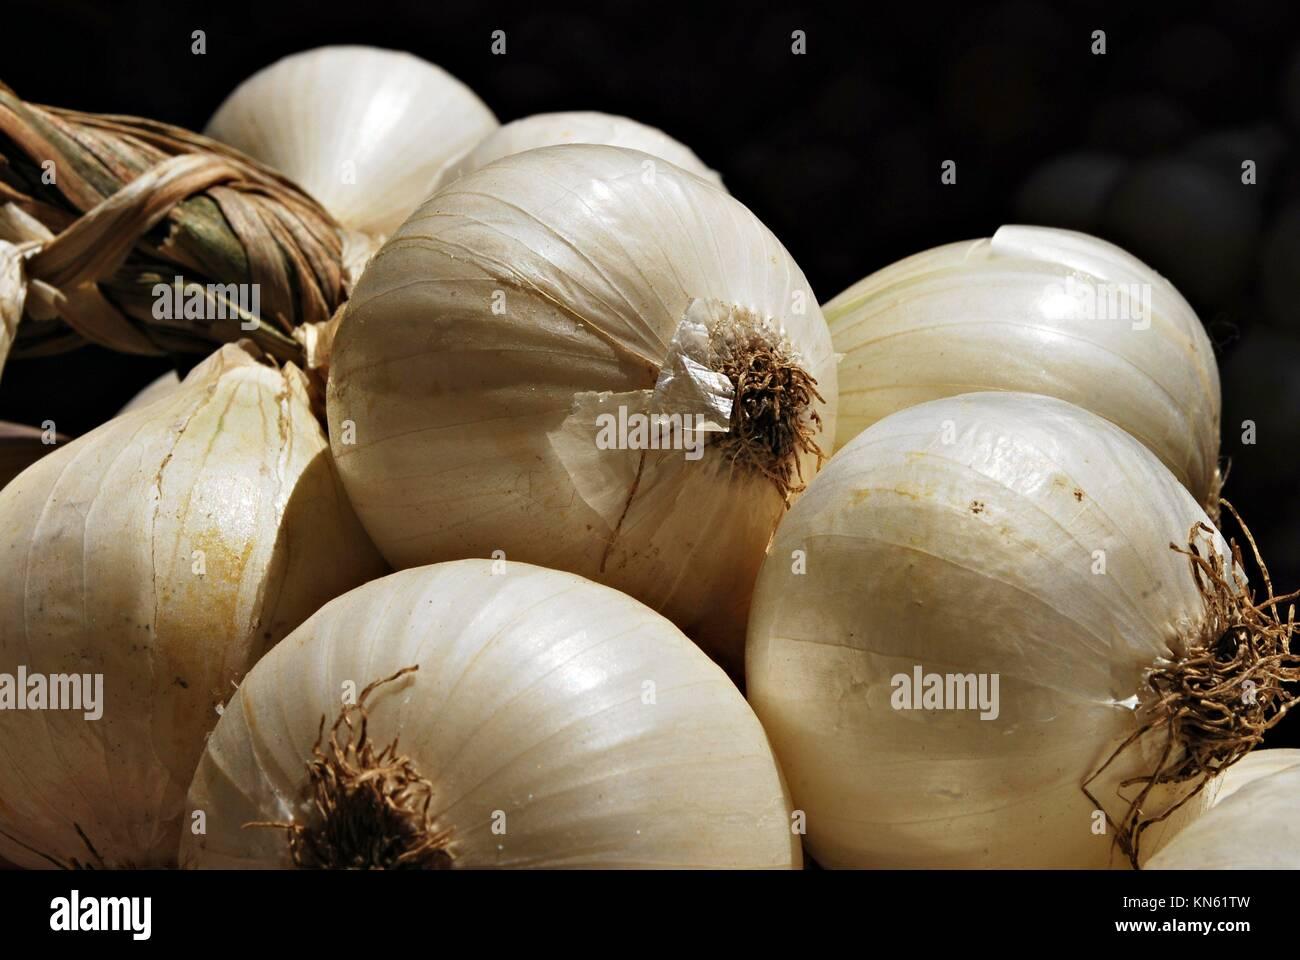 Haufen Zwiebel, Allium cepa, Poona, Mahrshtra, Indien. Stockbild